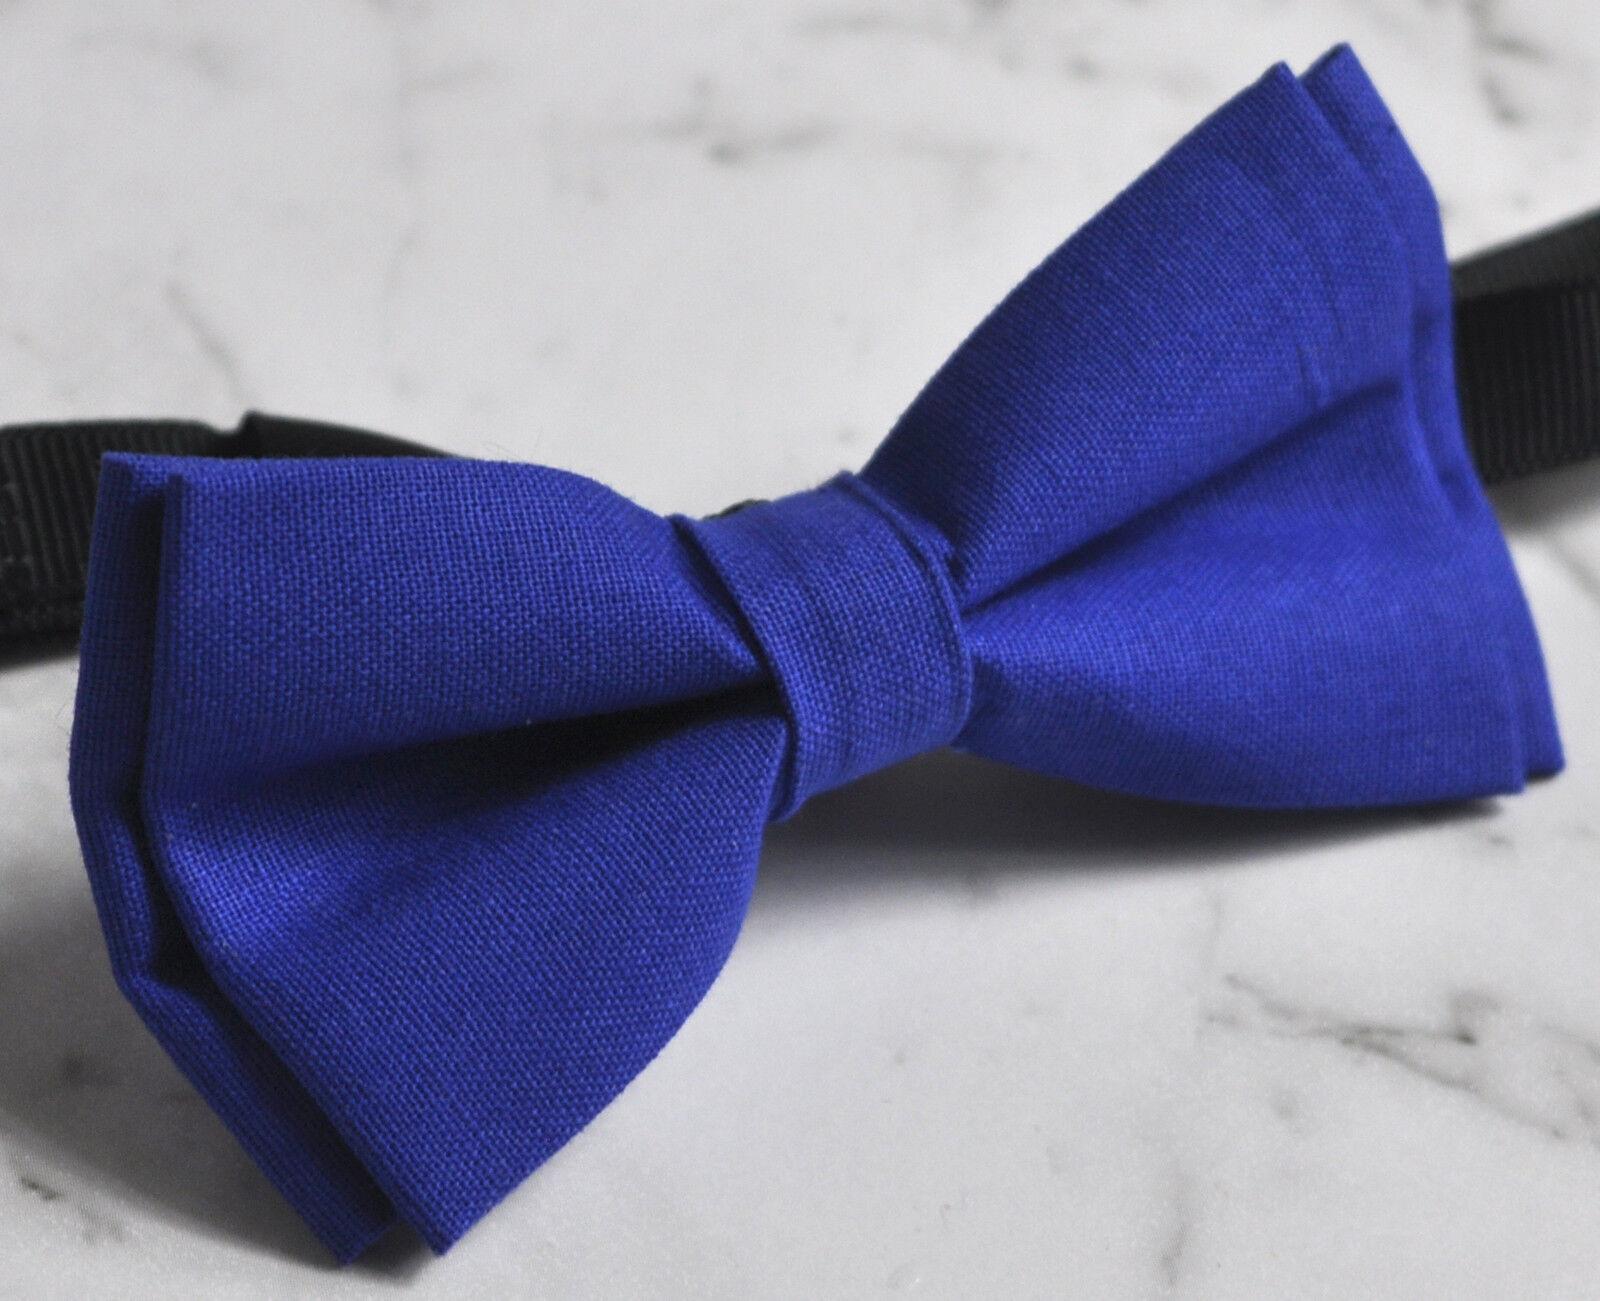 Boy Kids Baby 100/% Cotton Royal Blue Indigo Bow Tie Bowtie Wedding 1-6 Years Old